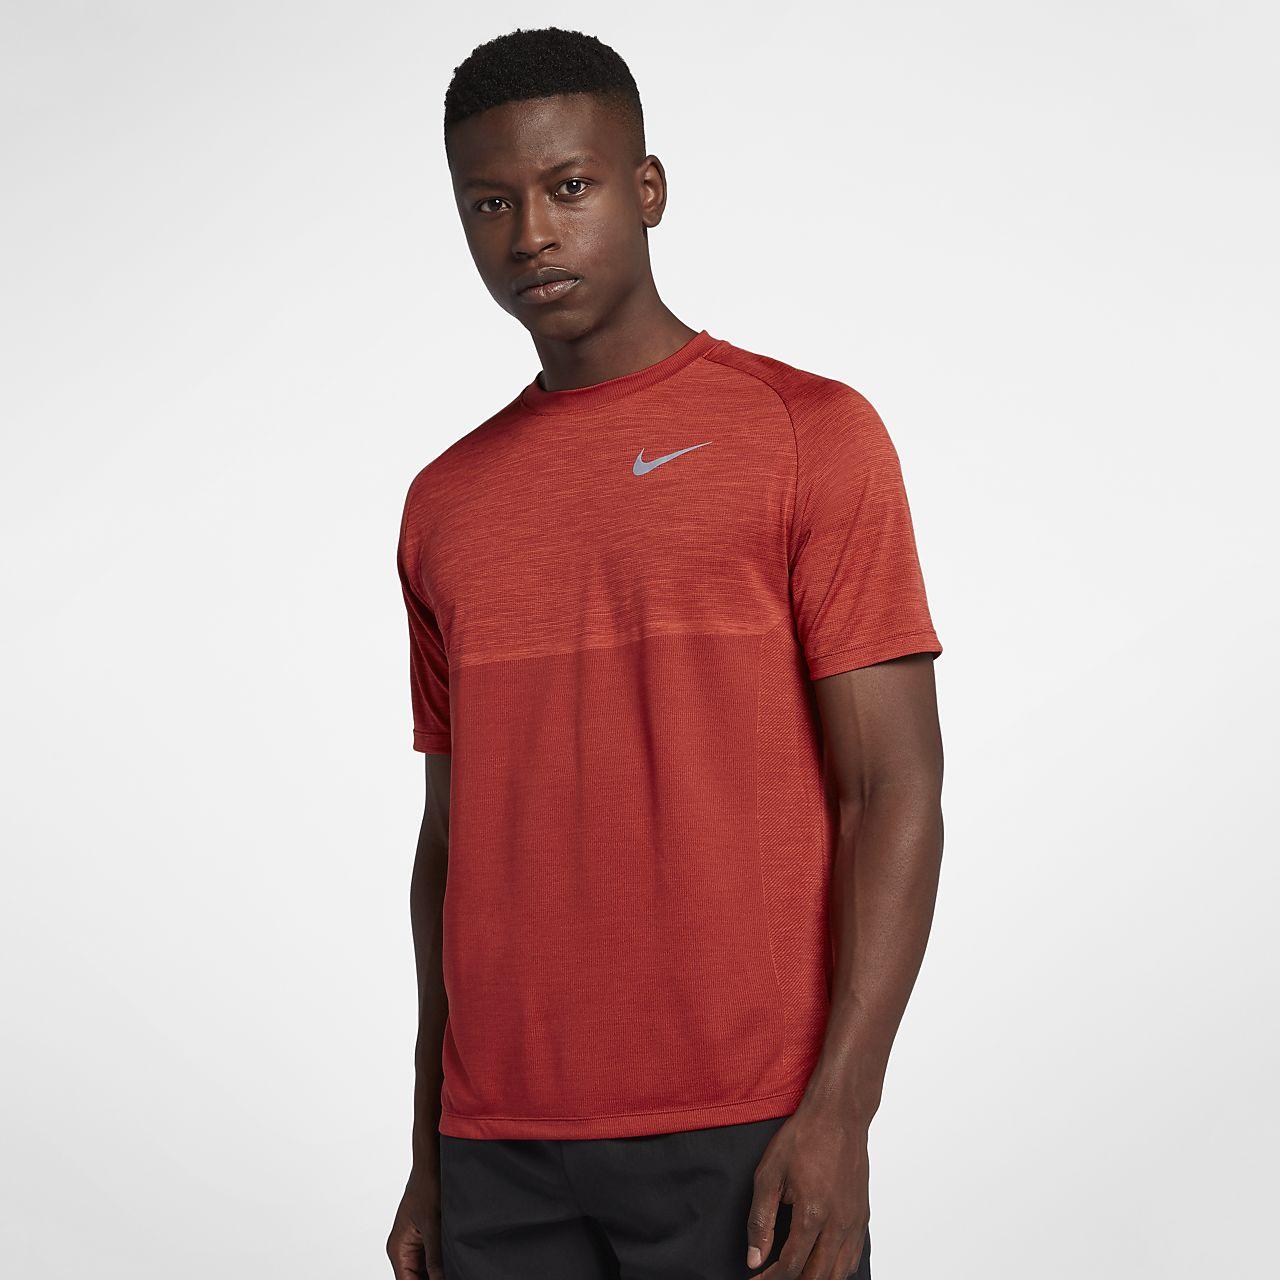 6452715a Nike Dri-FIT Medalist Men's Short-Sleeve Running Top. Nike.com CH